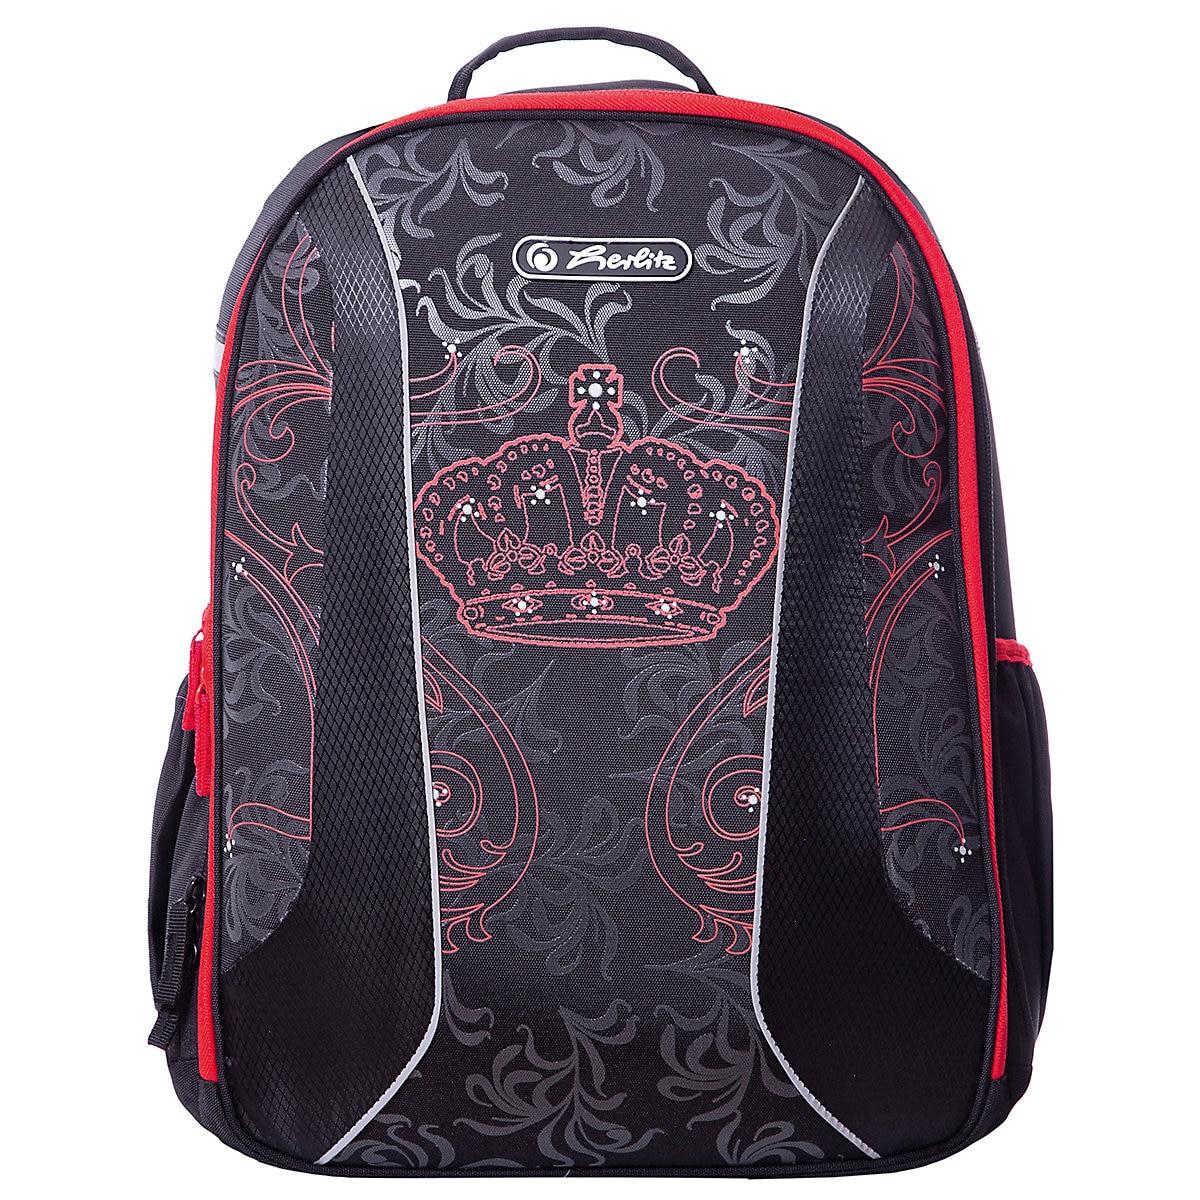 School Bags HERLITZ 7936523 Schoolbag Backpack Orthopedic Bag For Boy And Girl Animals Flowers